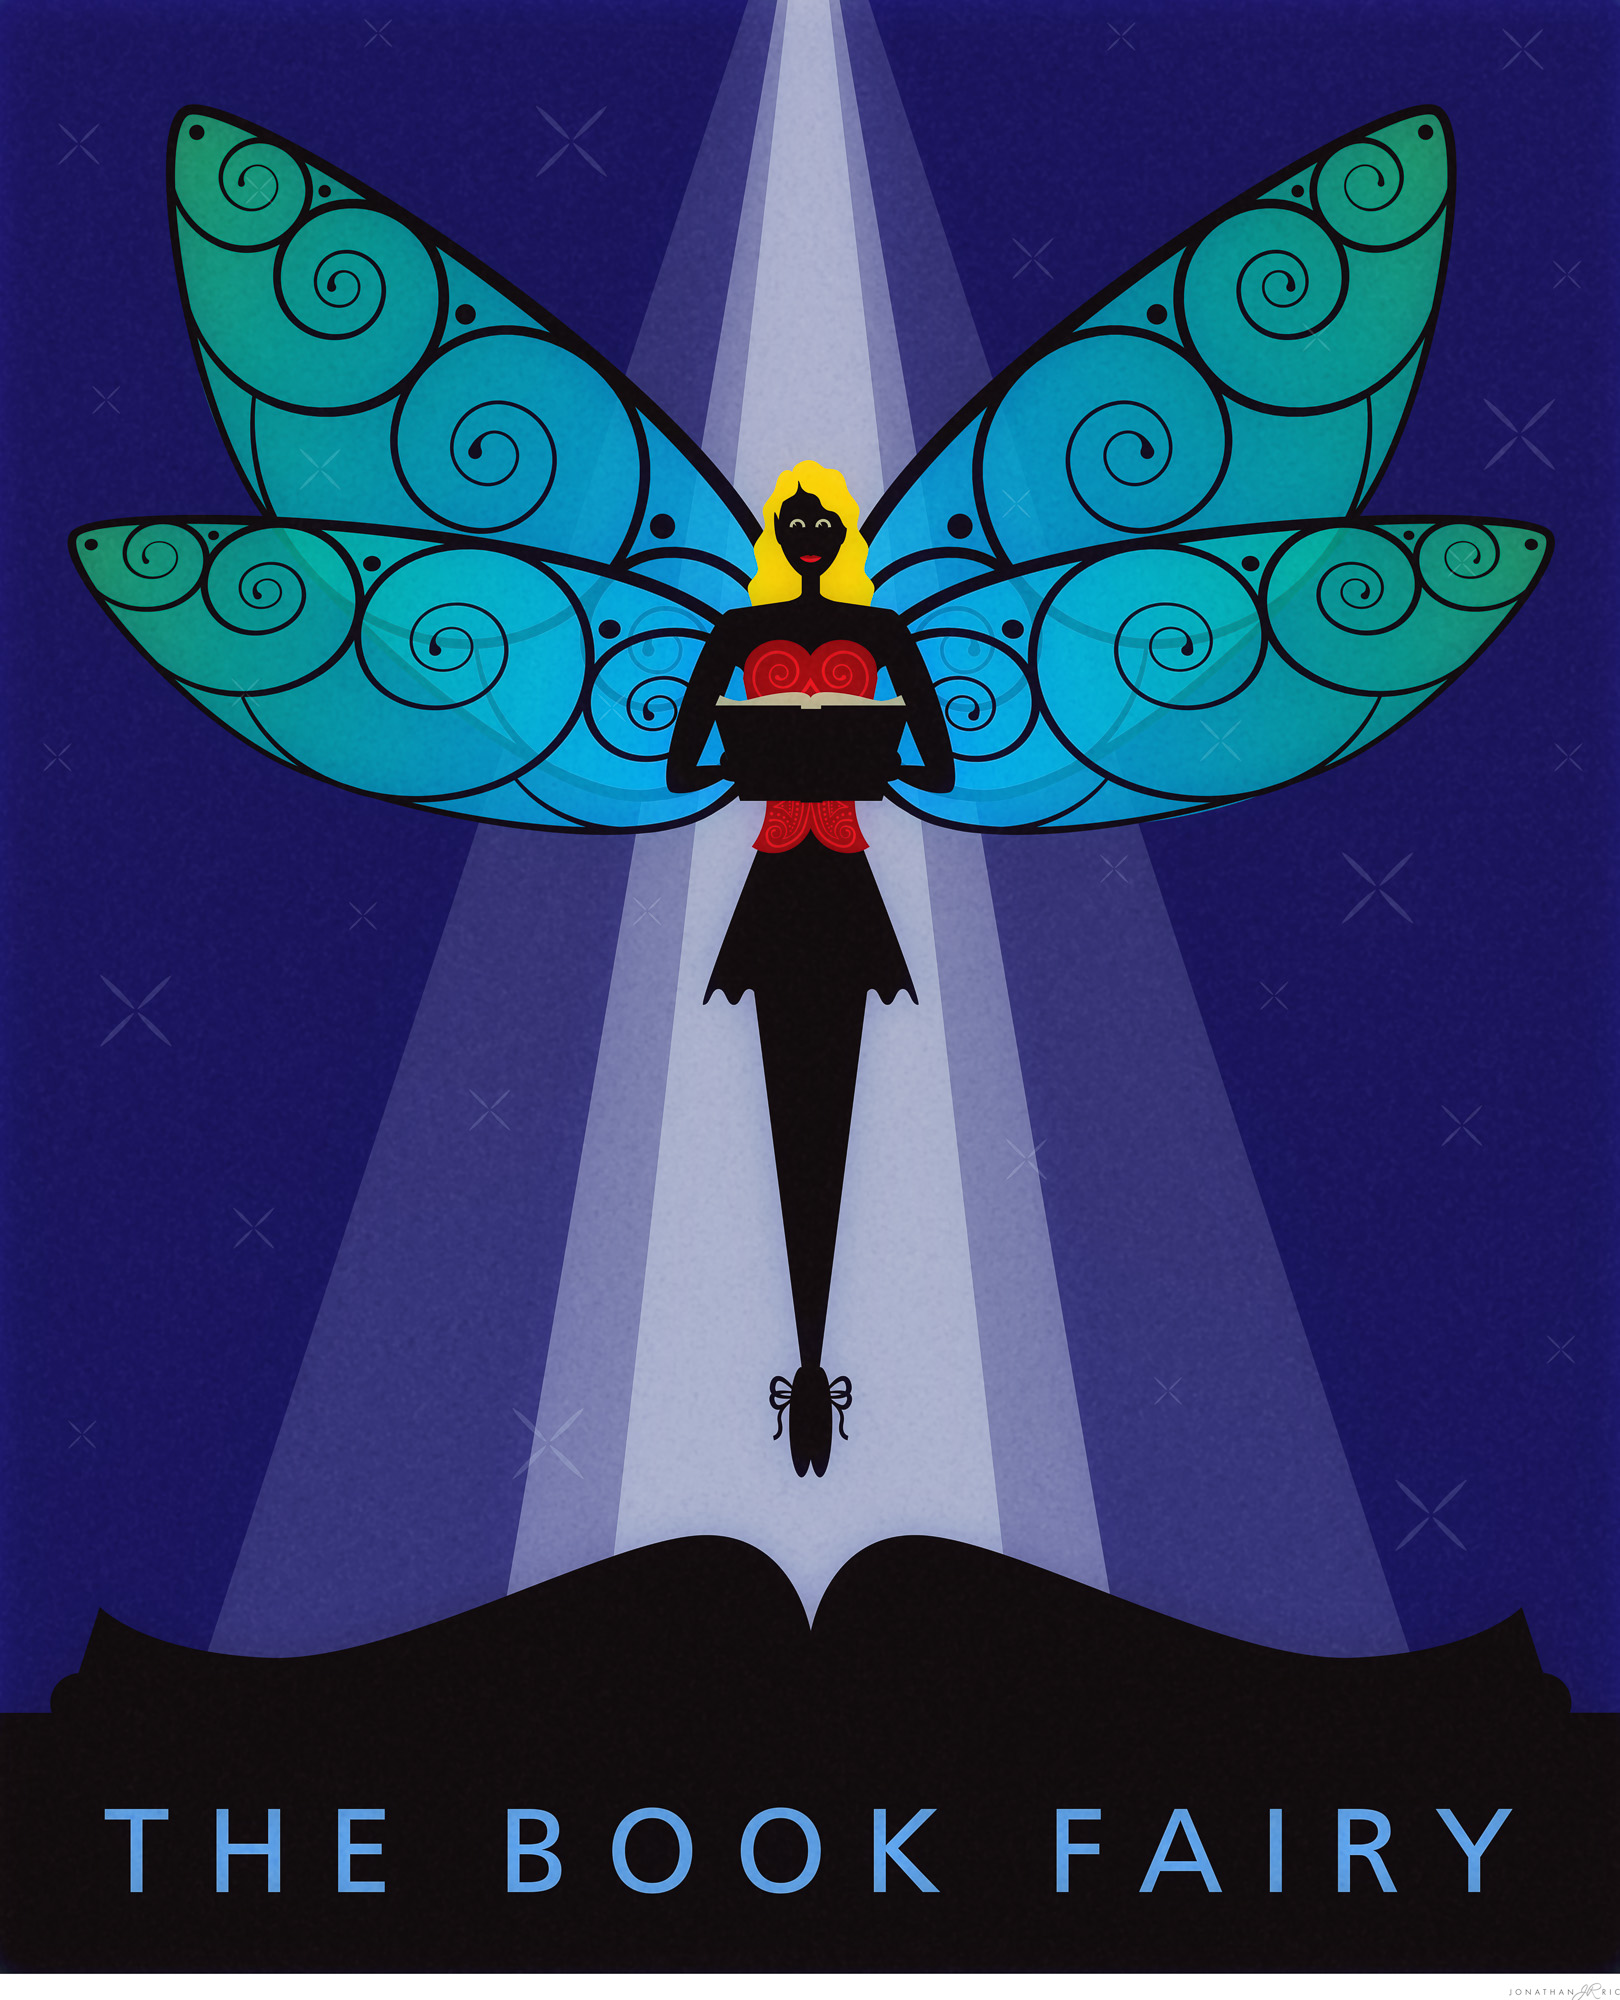 The Book Fairy